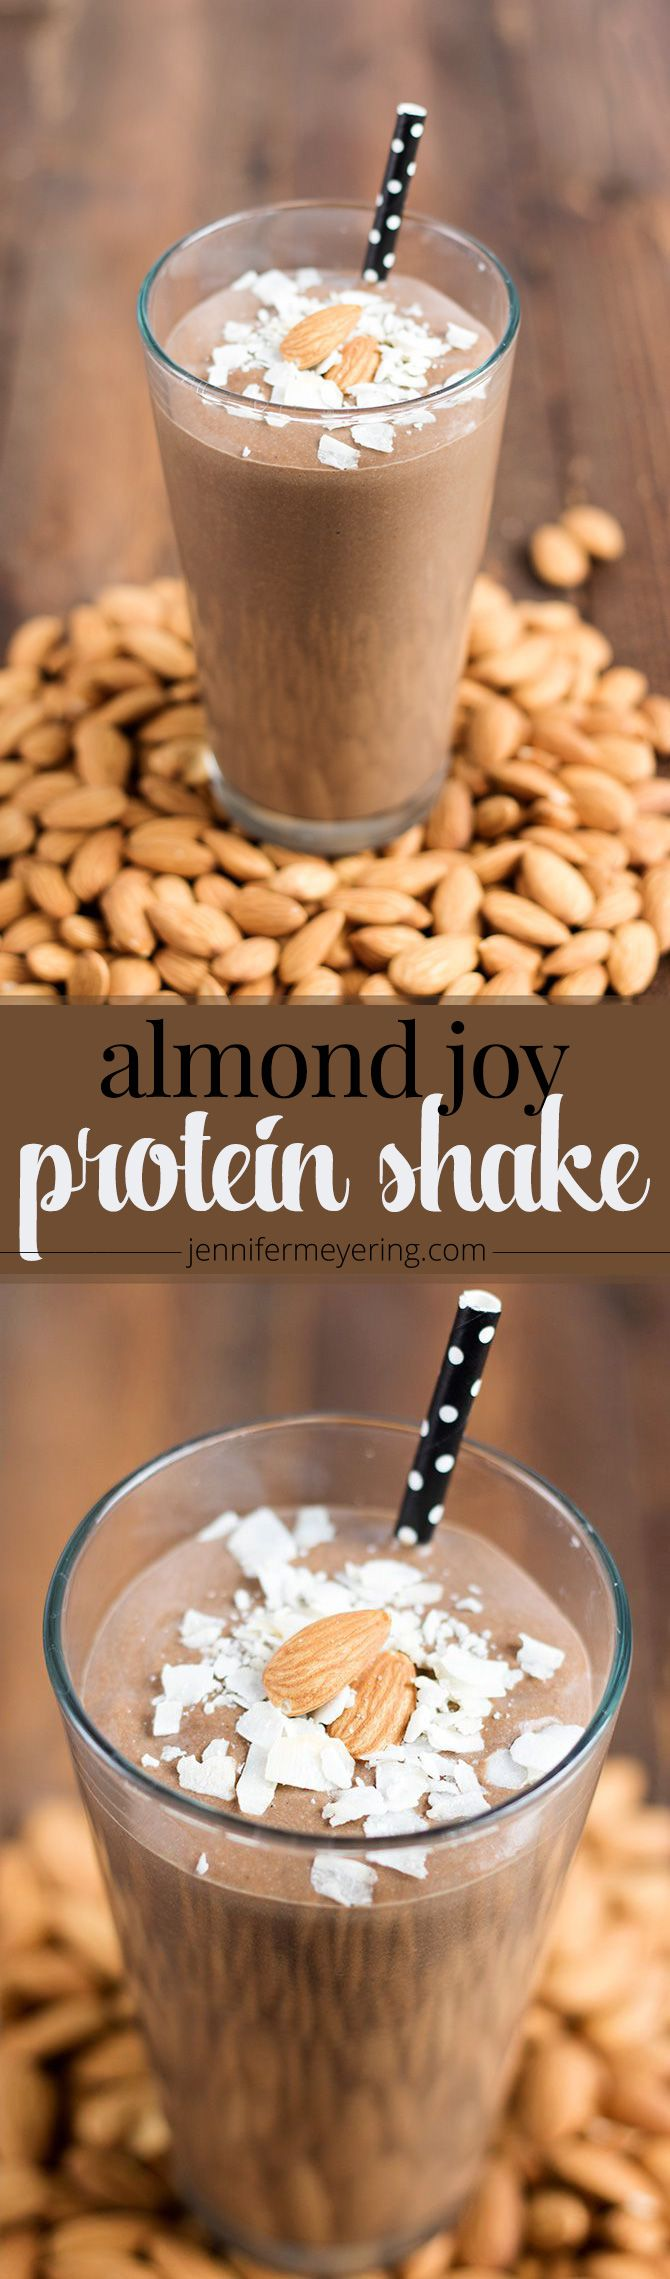 Almond Joy Protein Shake - JenniferMeyering.com